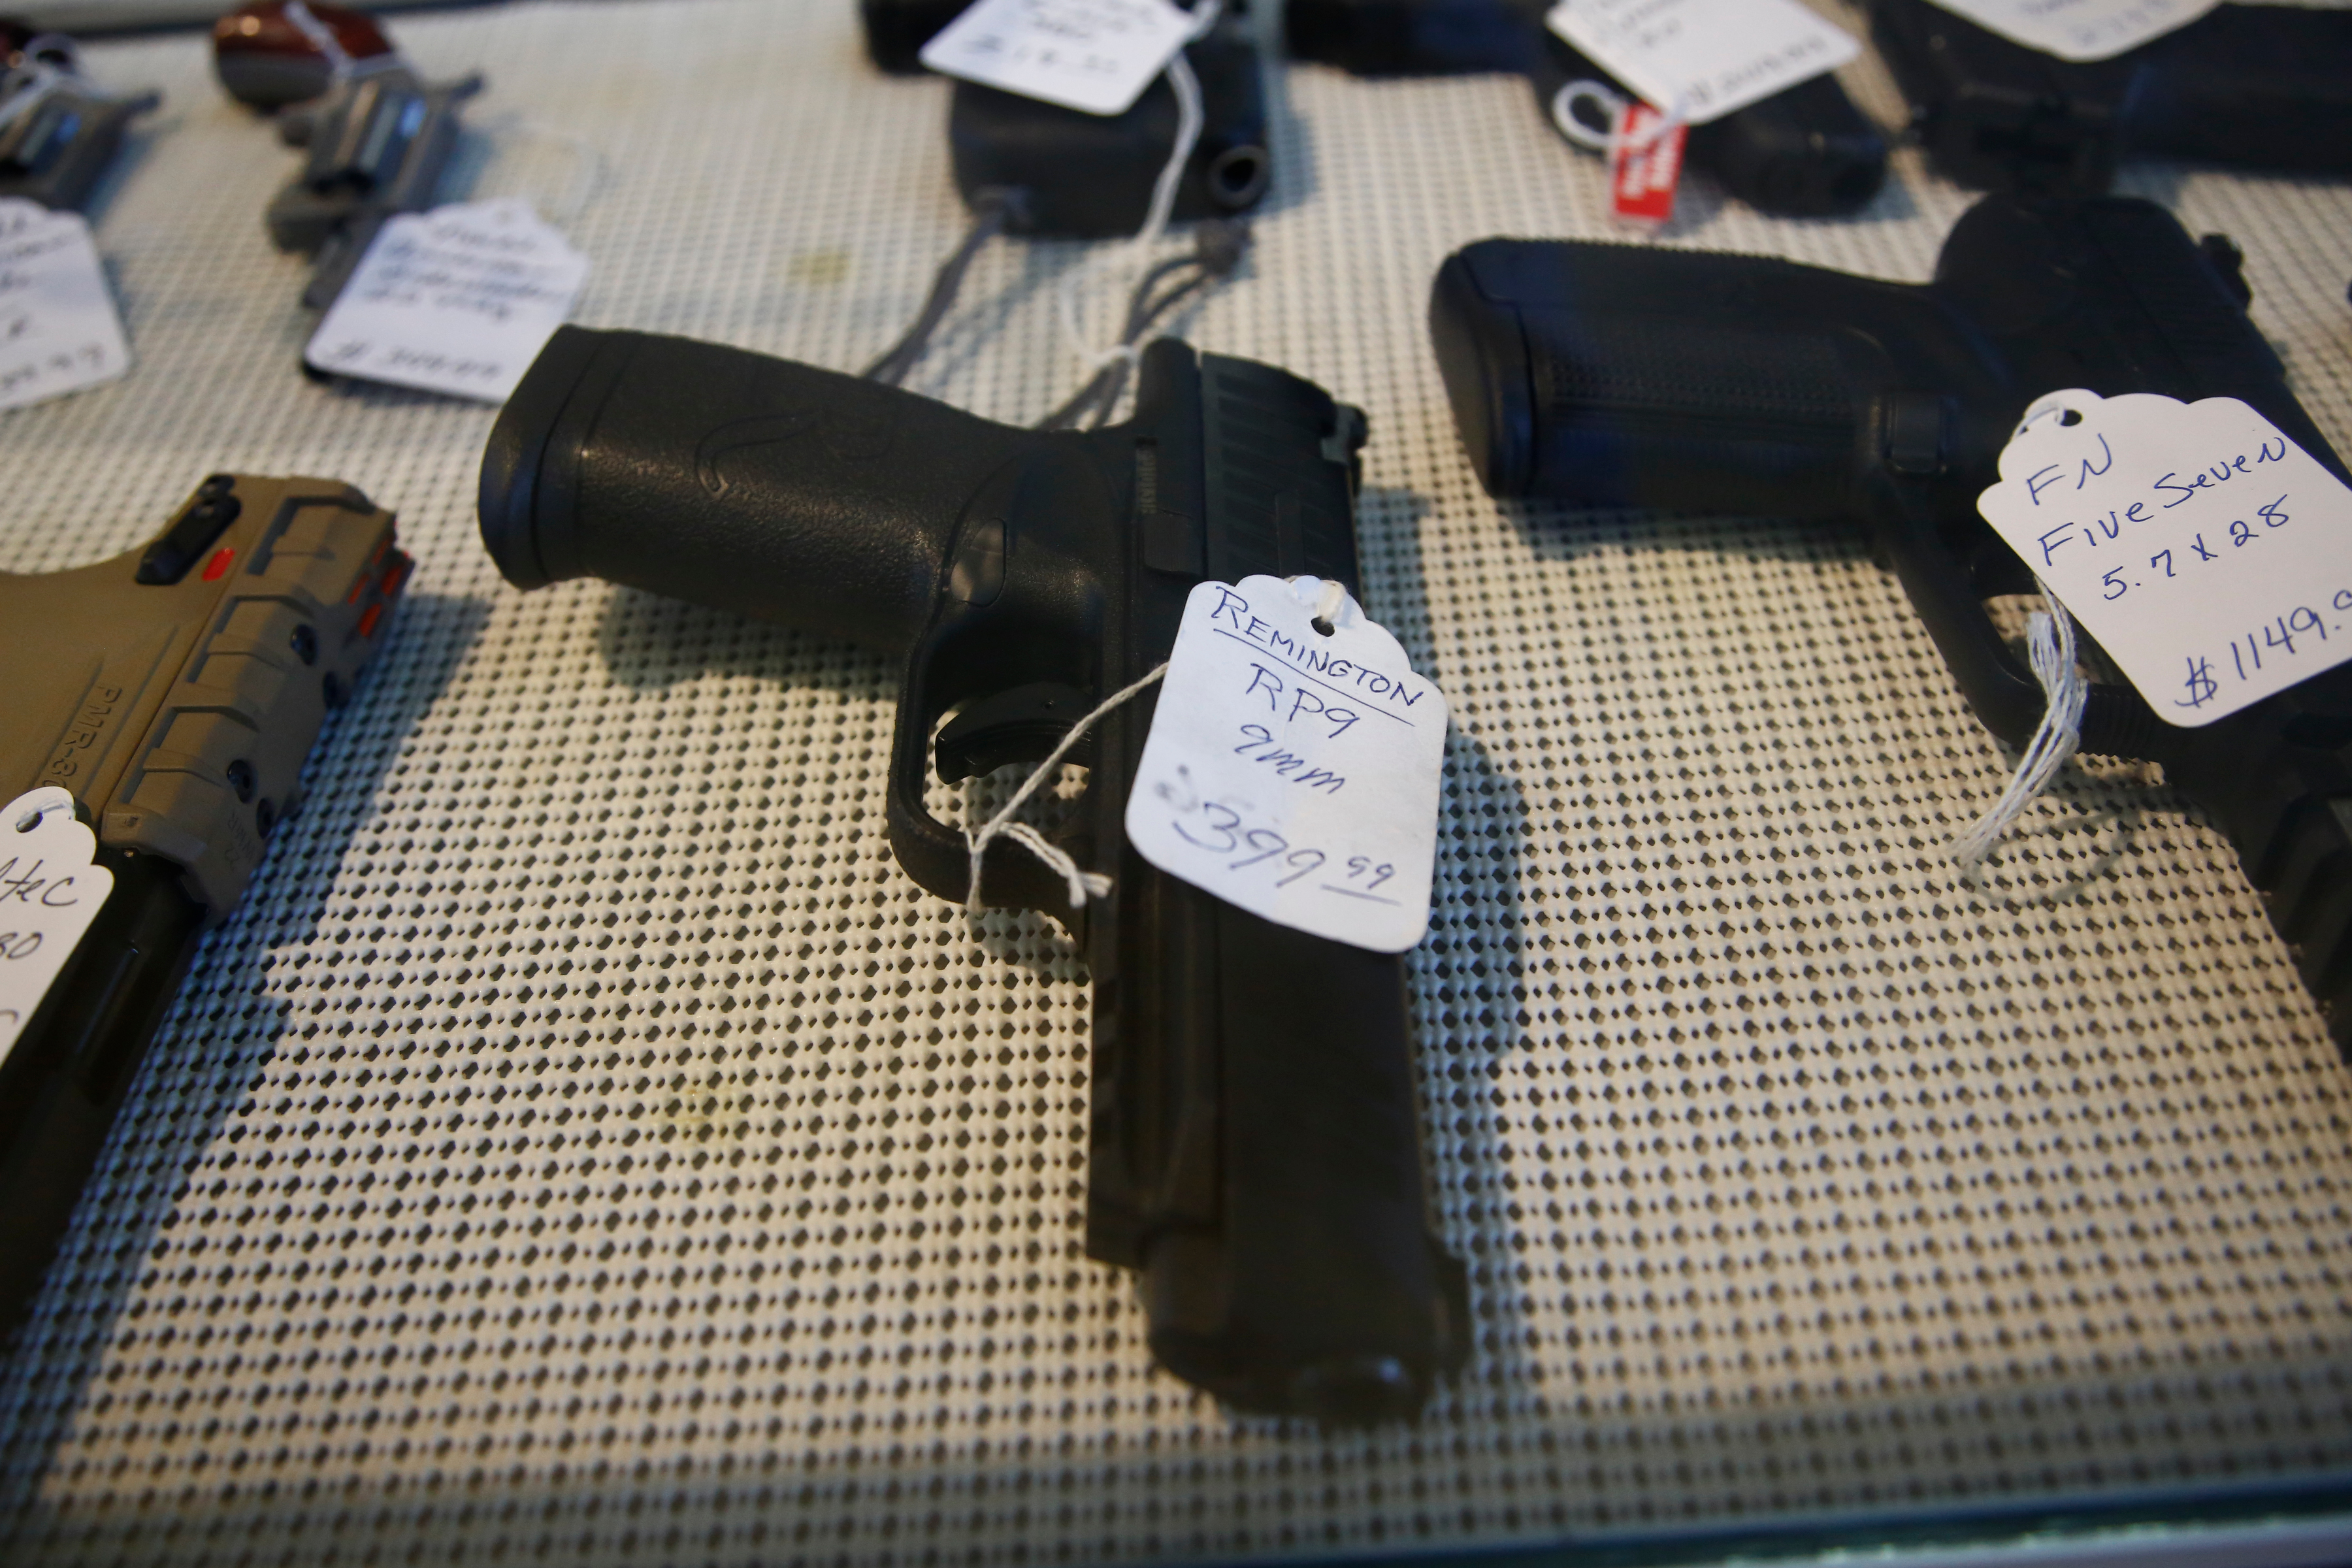 Gun Manufacturer Remington Files For Chapter 11 Bankruptcy Protection